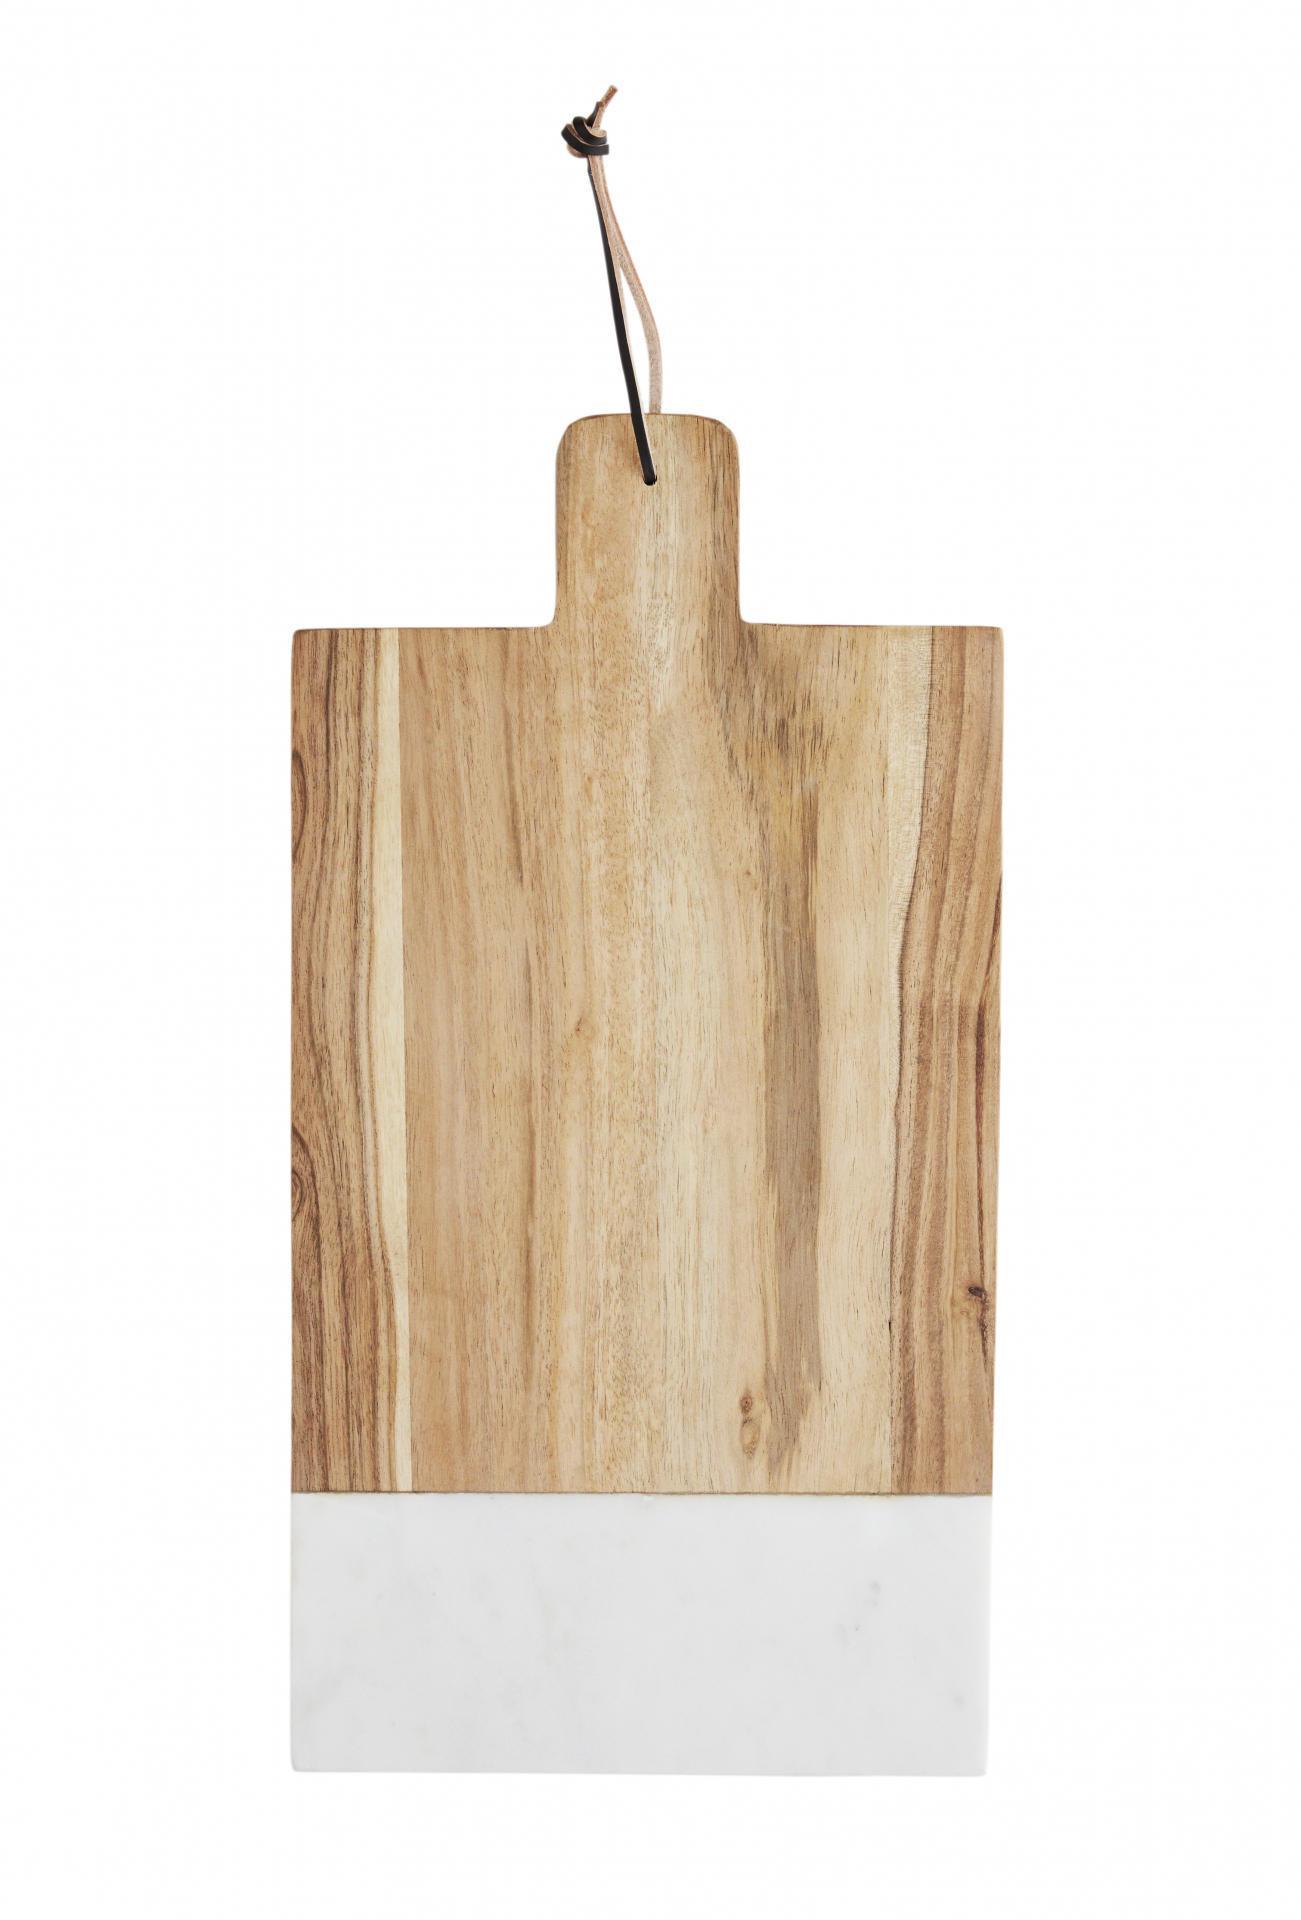 MADAM STOLTZ Krájecí prkénko Wood/Marble, bílá barva, hnědá barva, dřevo, mramor